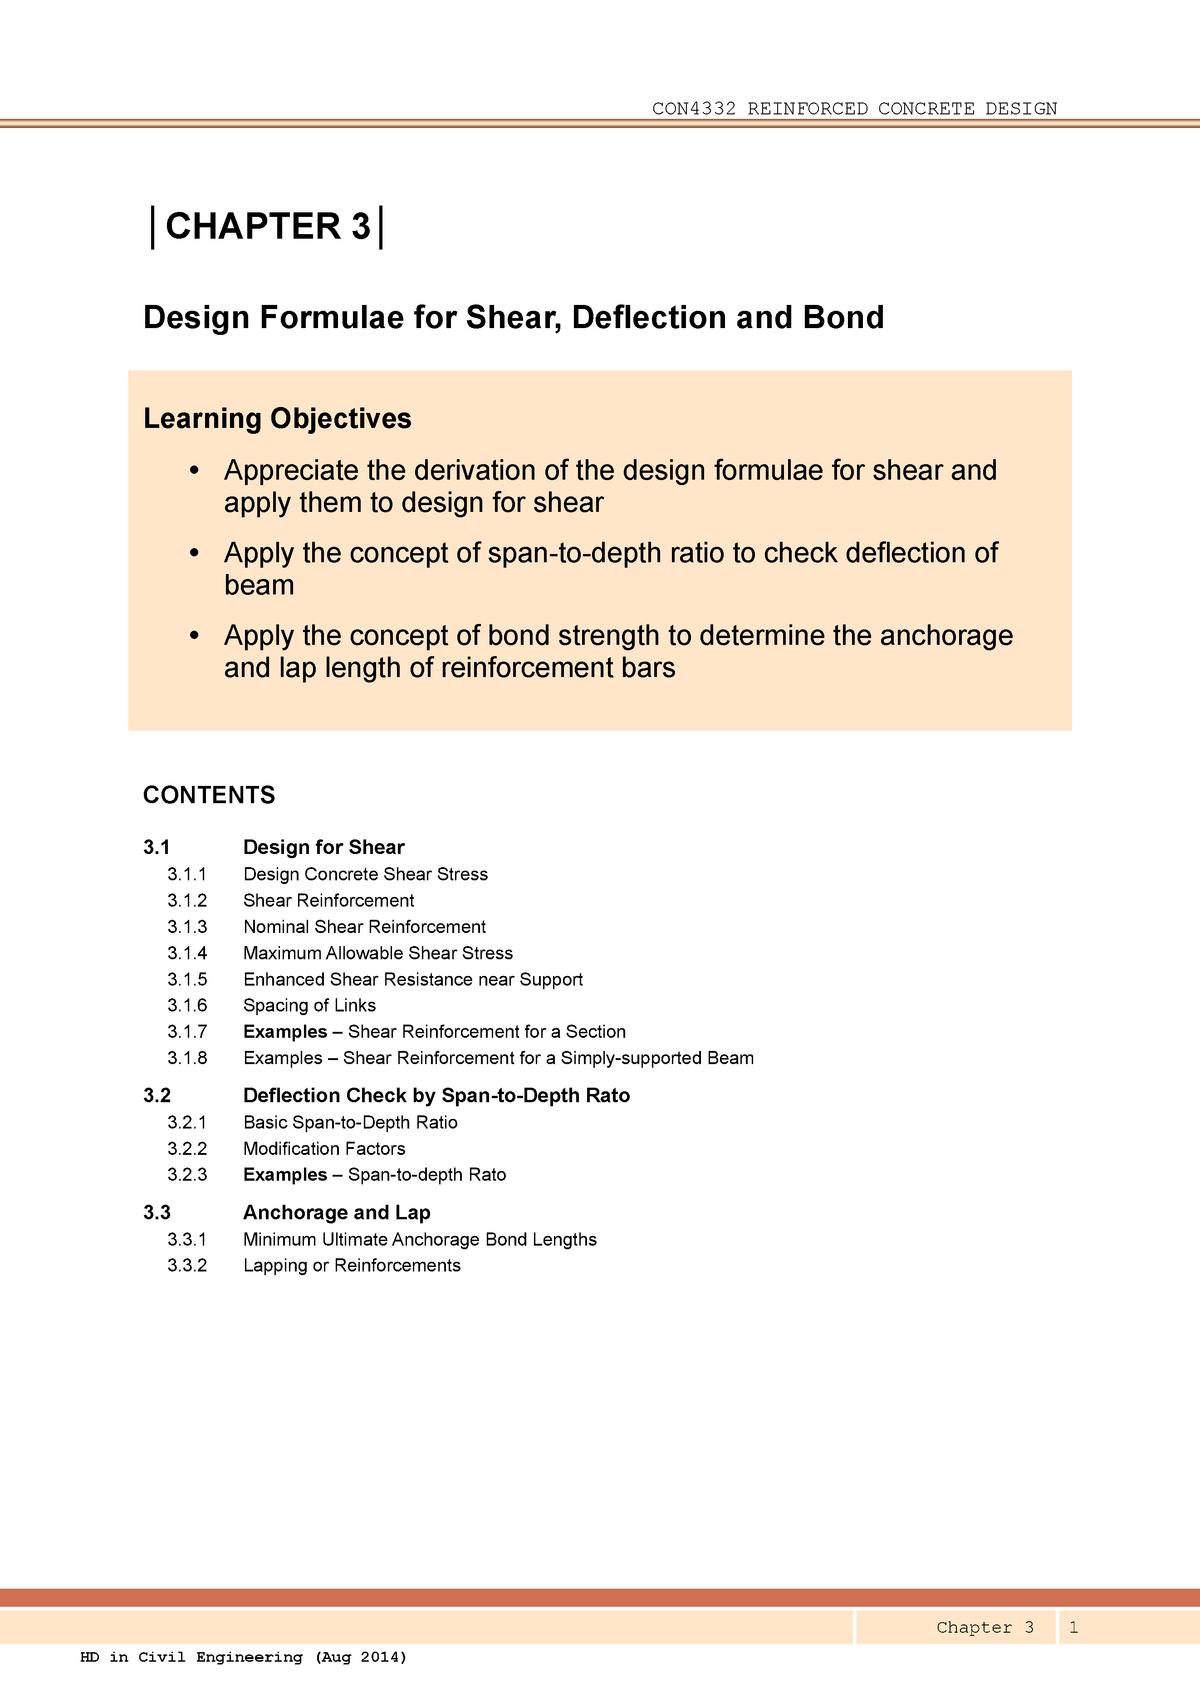 R3 Design Formulae for Shear Deflection Bond (2014-08-01